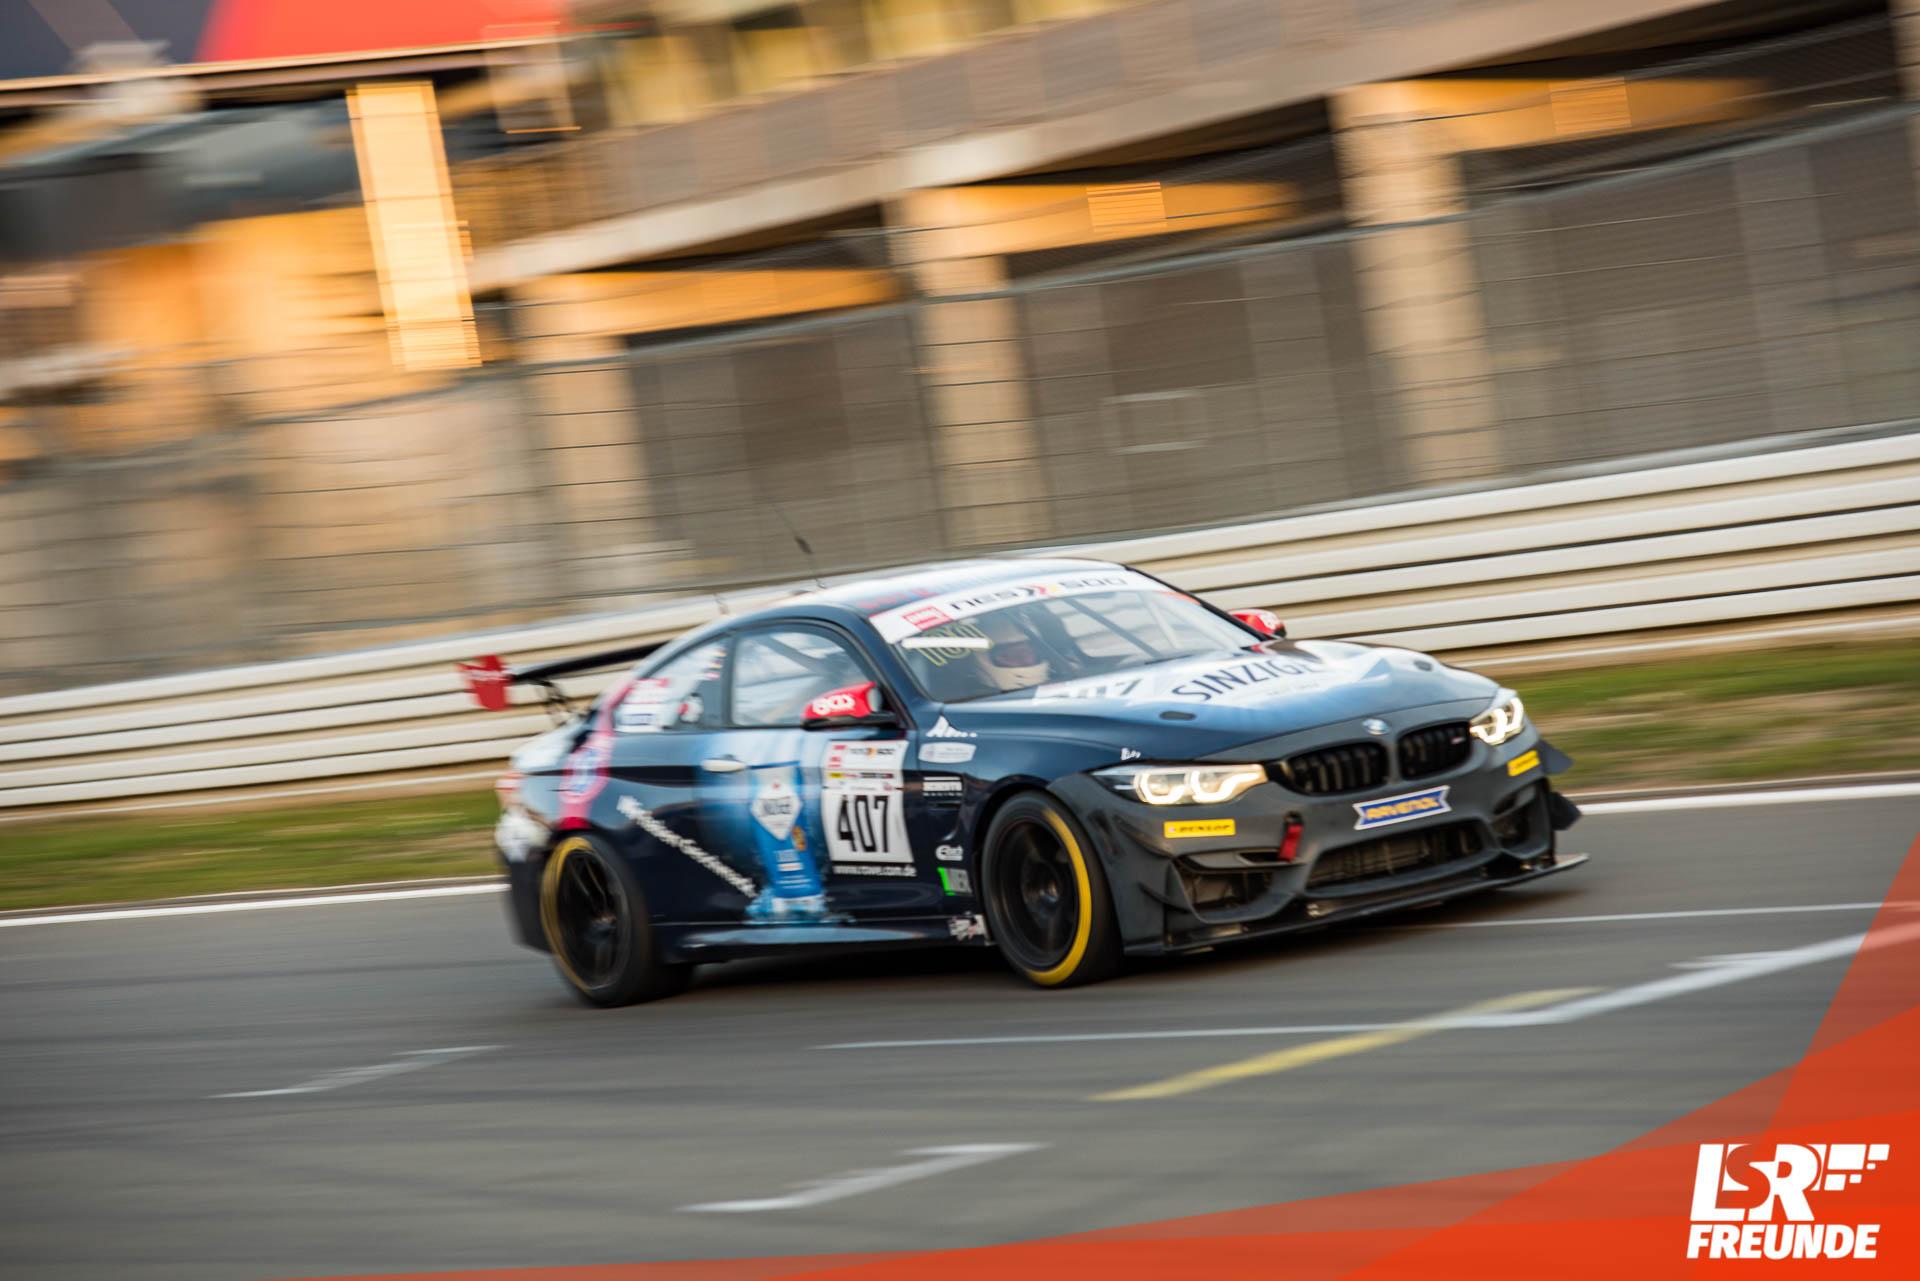 Team Securtal Sorg Rennsport BMW M4 GT4 #407 NES 500 Greenhell1000 2018 Nürburgring